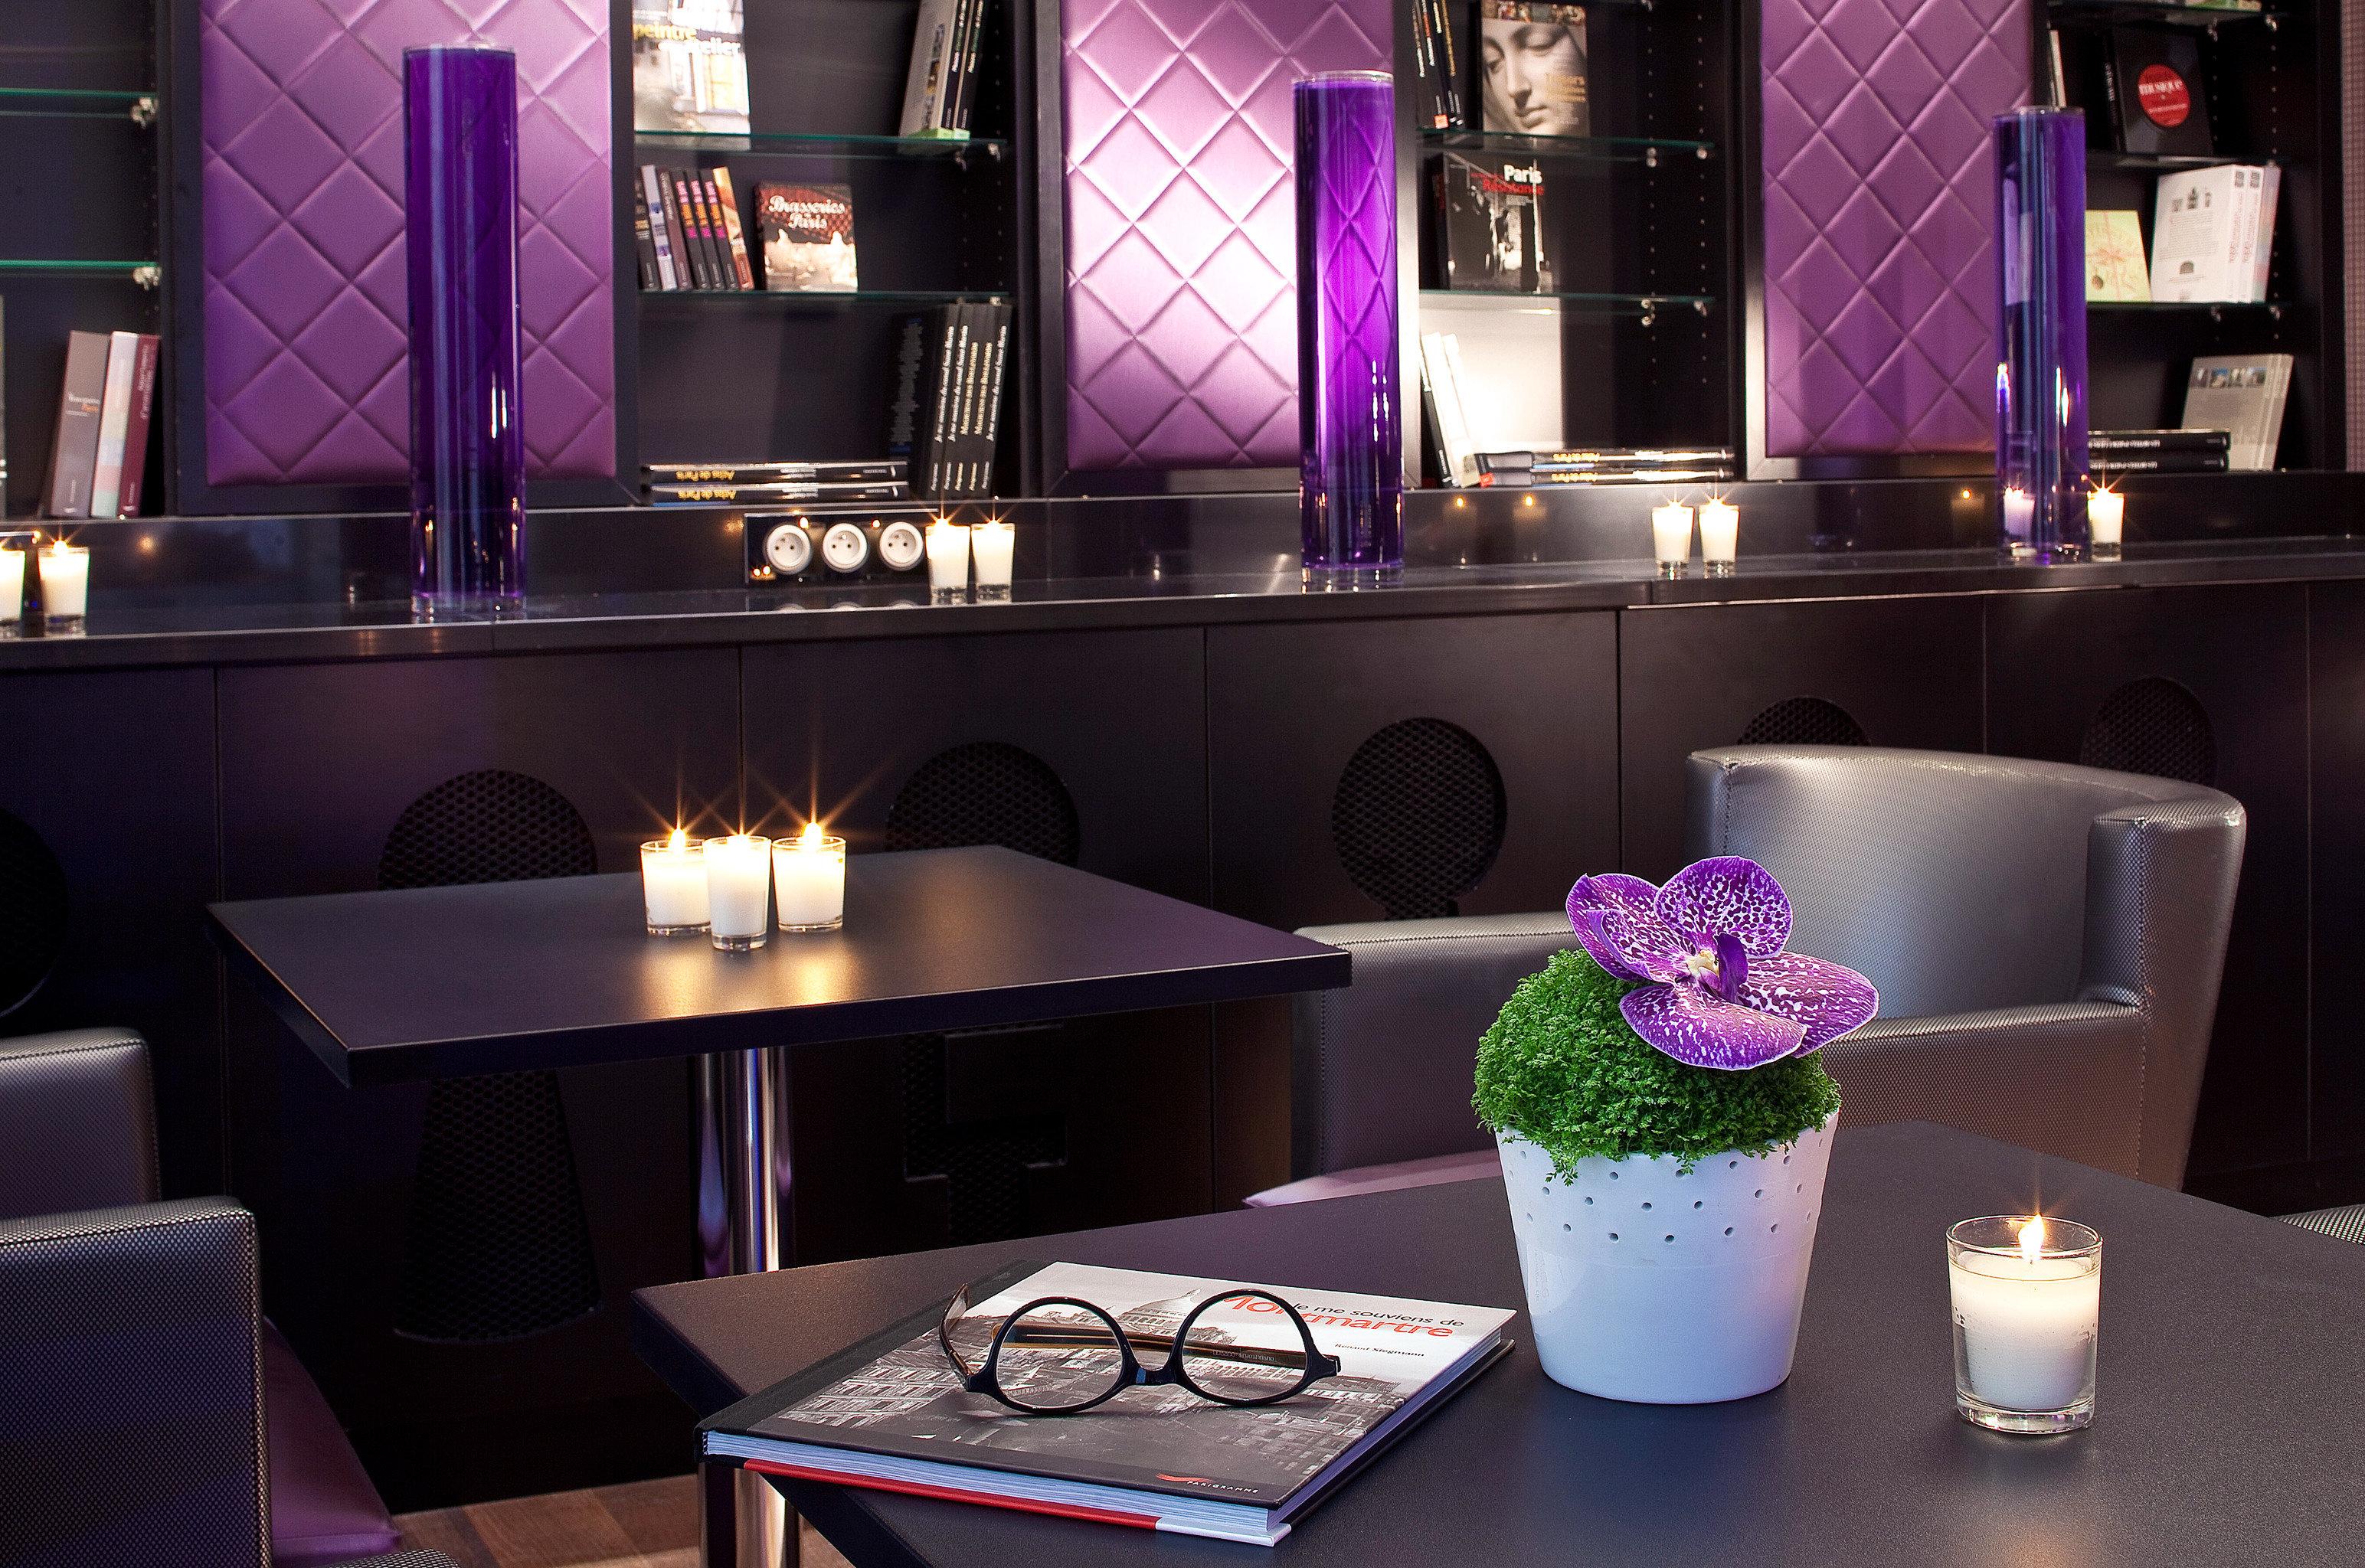 Grounds Hip Nightlife Play Romance Romantic purple Bar lighting restaurant Suite nightclub living room